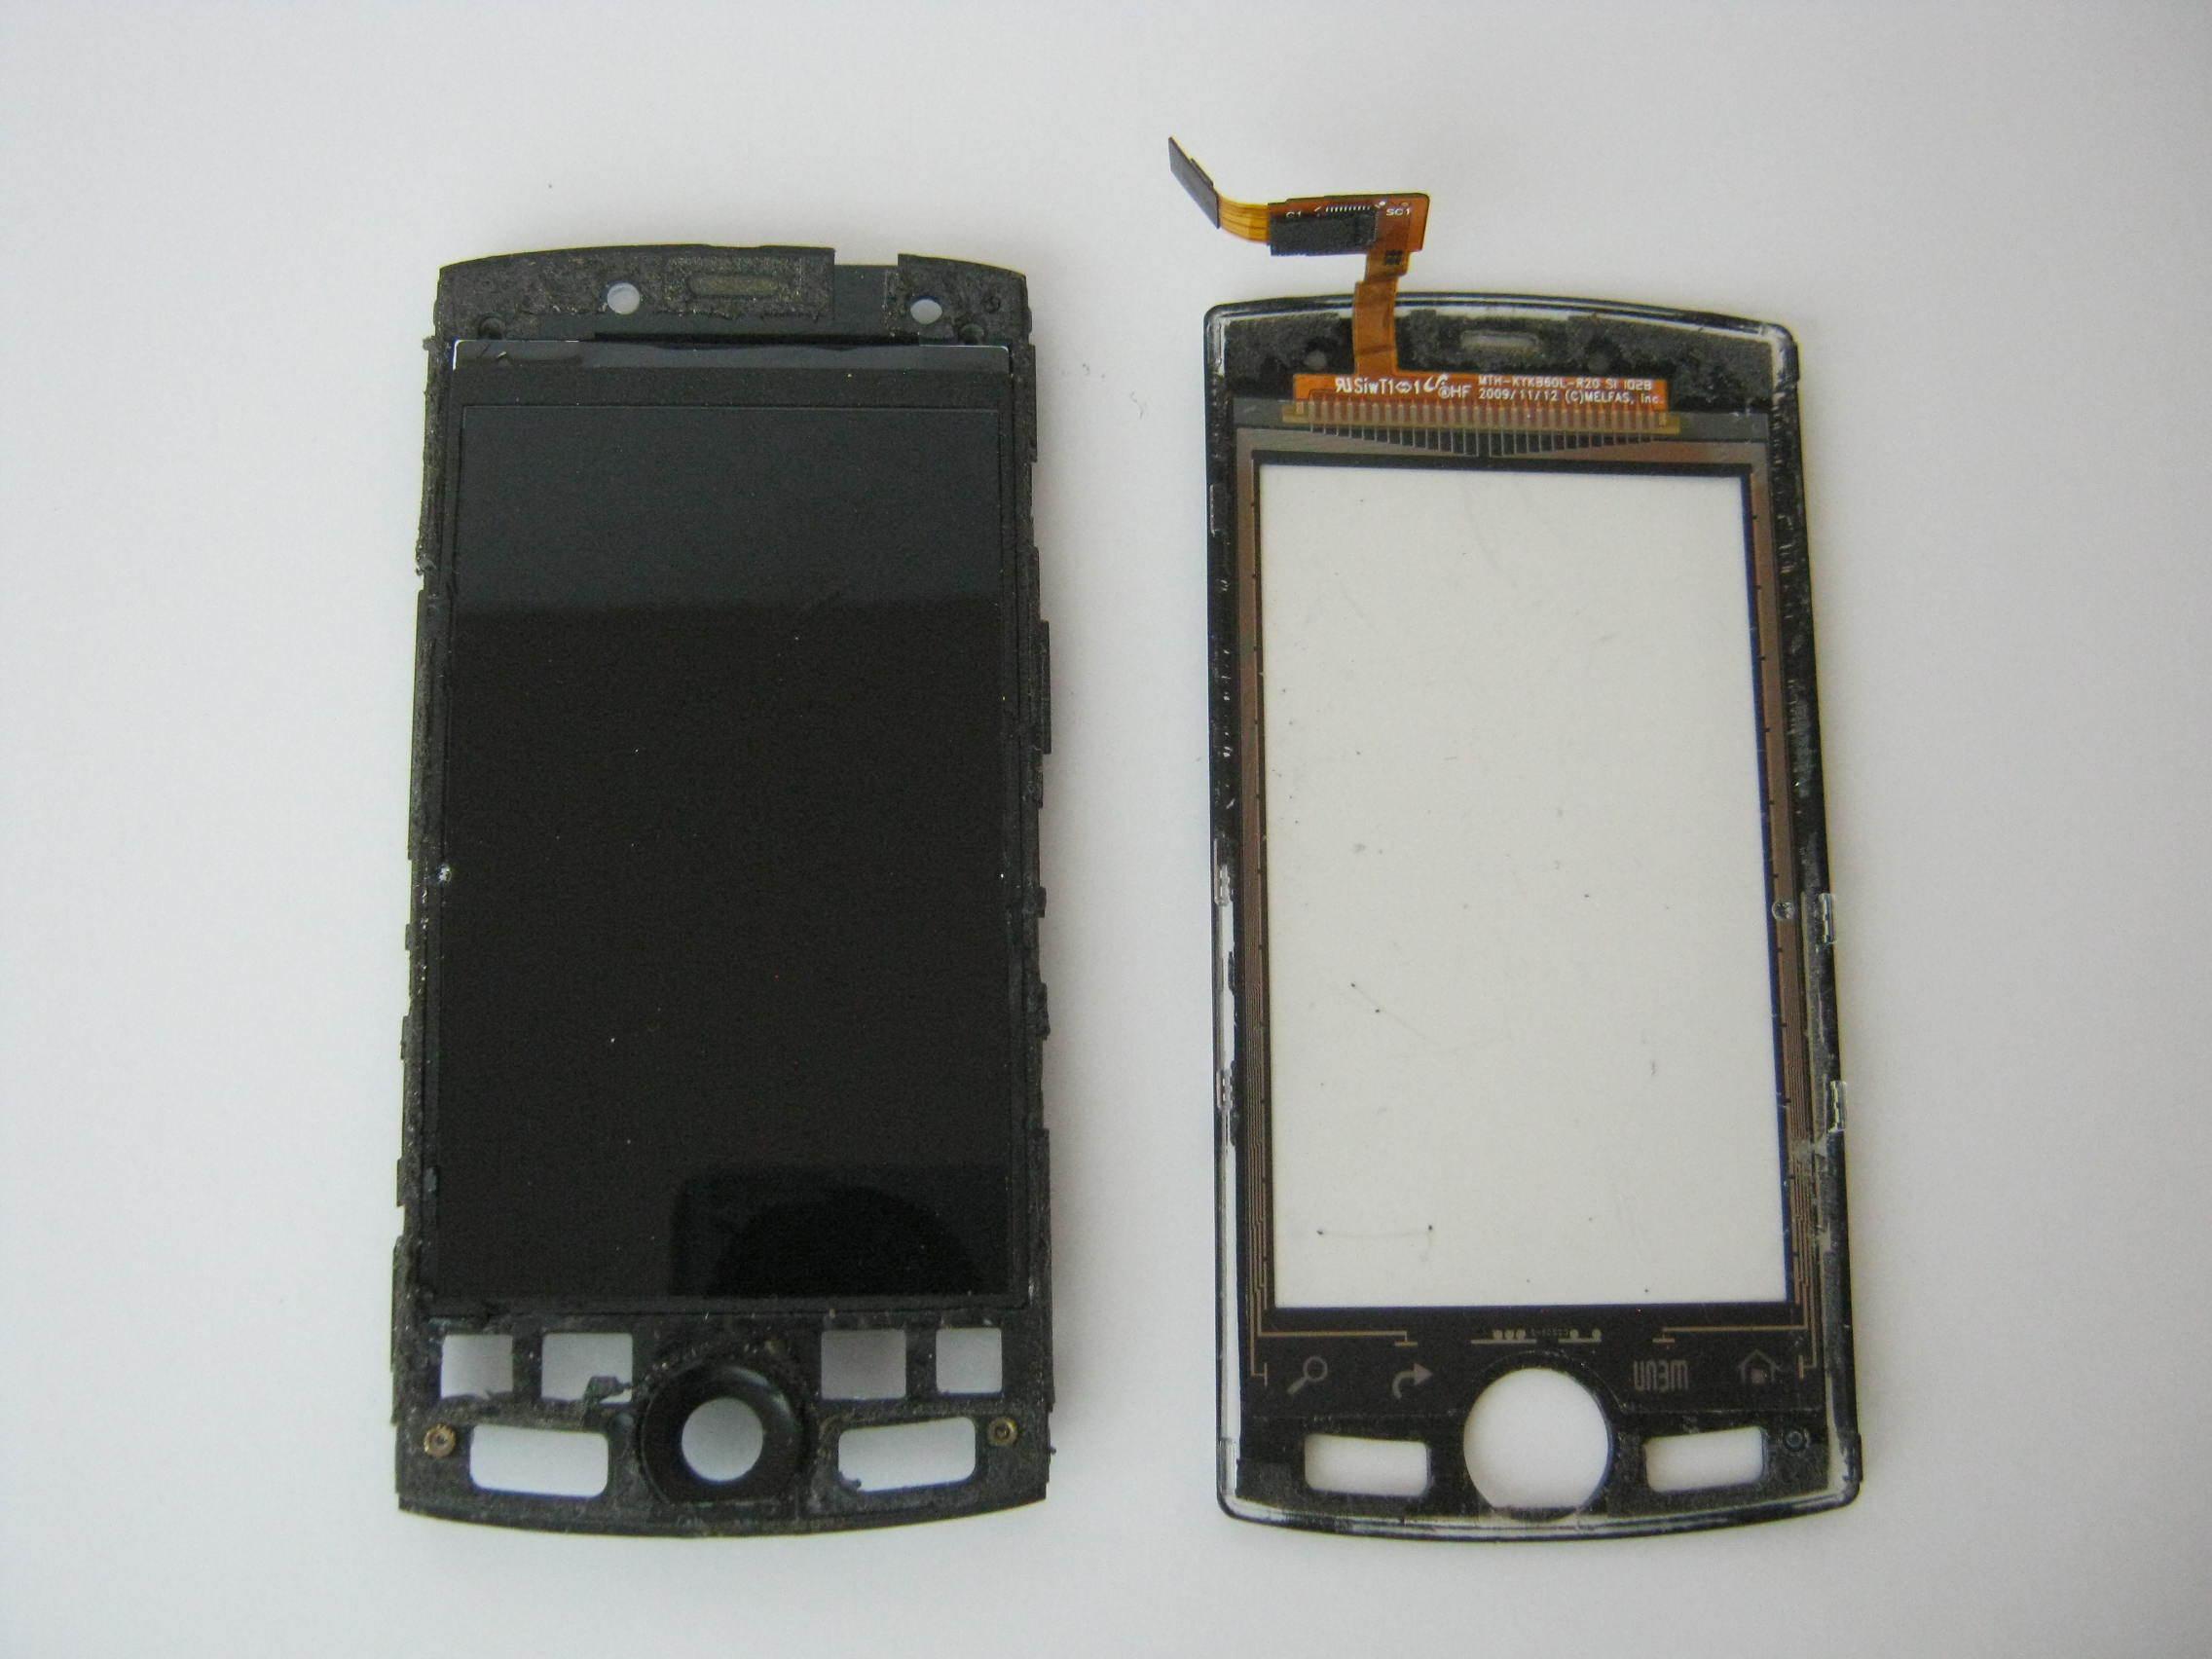 kyocera zio m6000 digitizer replacement ifixit repair guide rh ifixit com